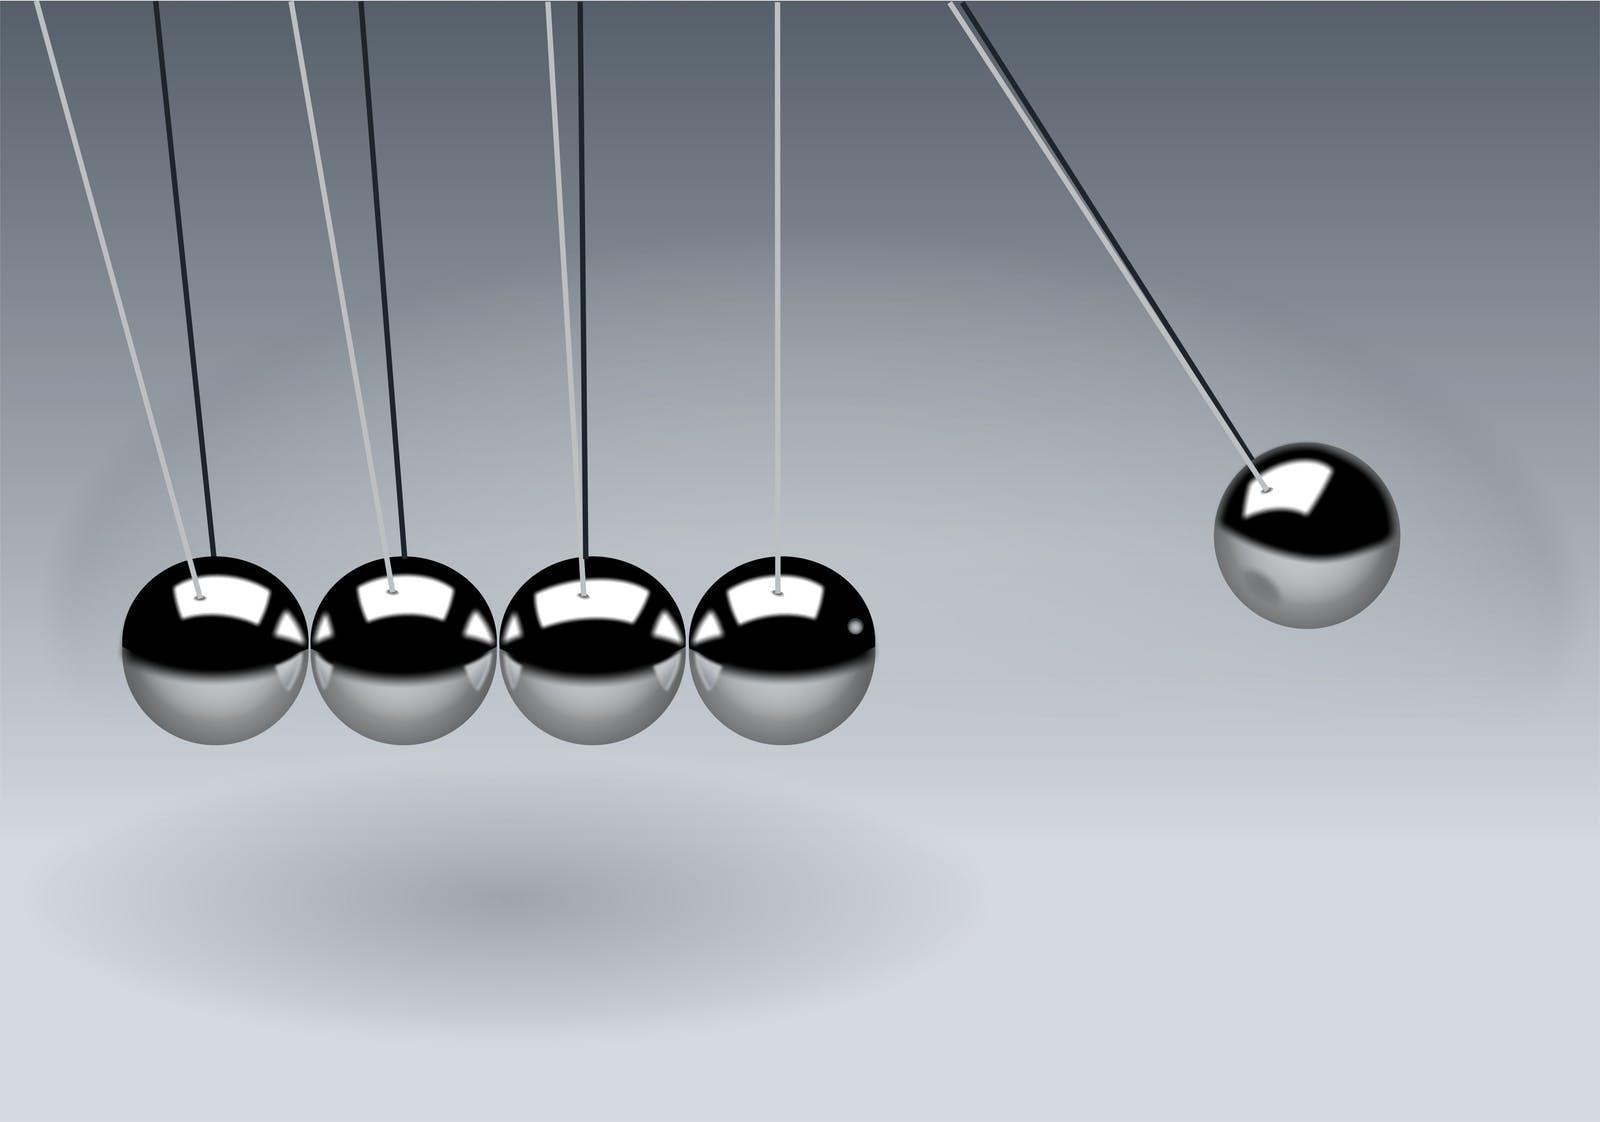 127450_newton-s-cradle-balls-sphere-action-60582.jpeg